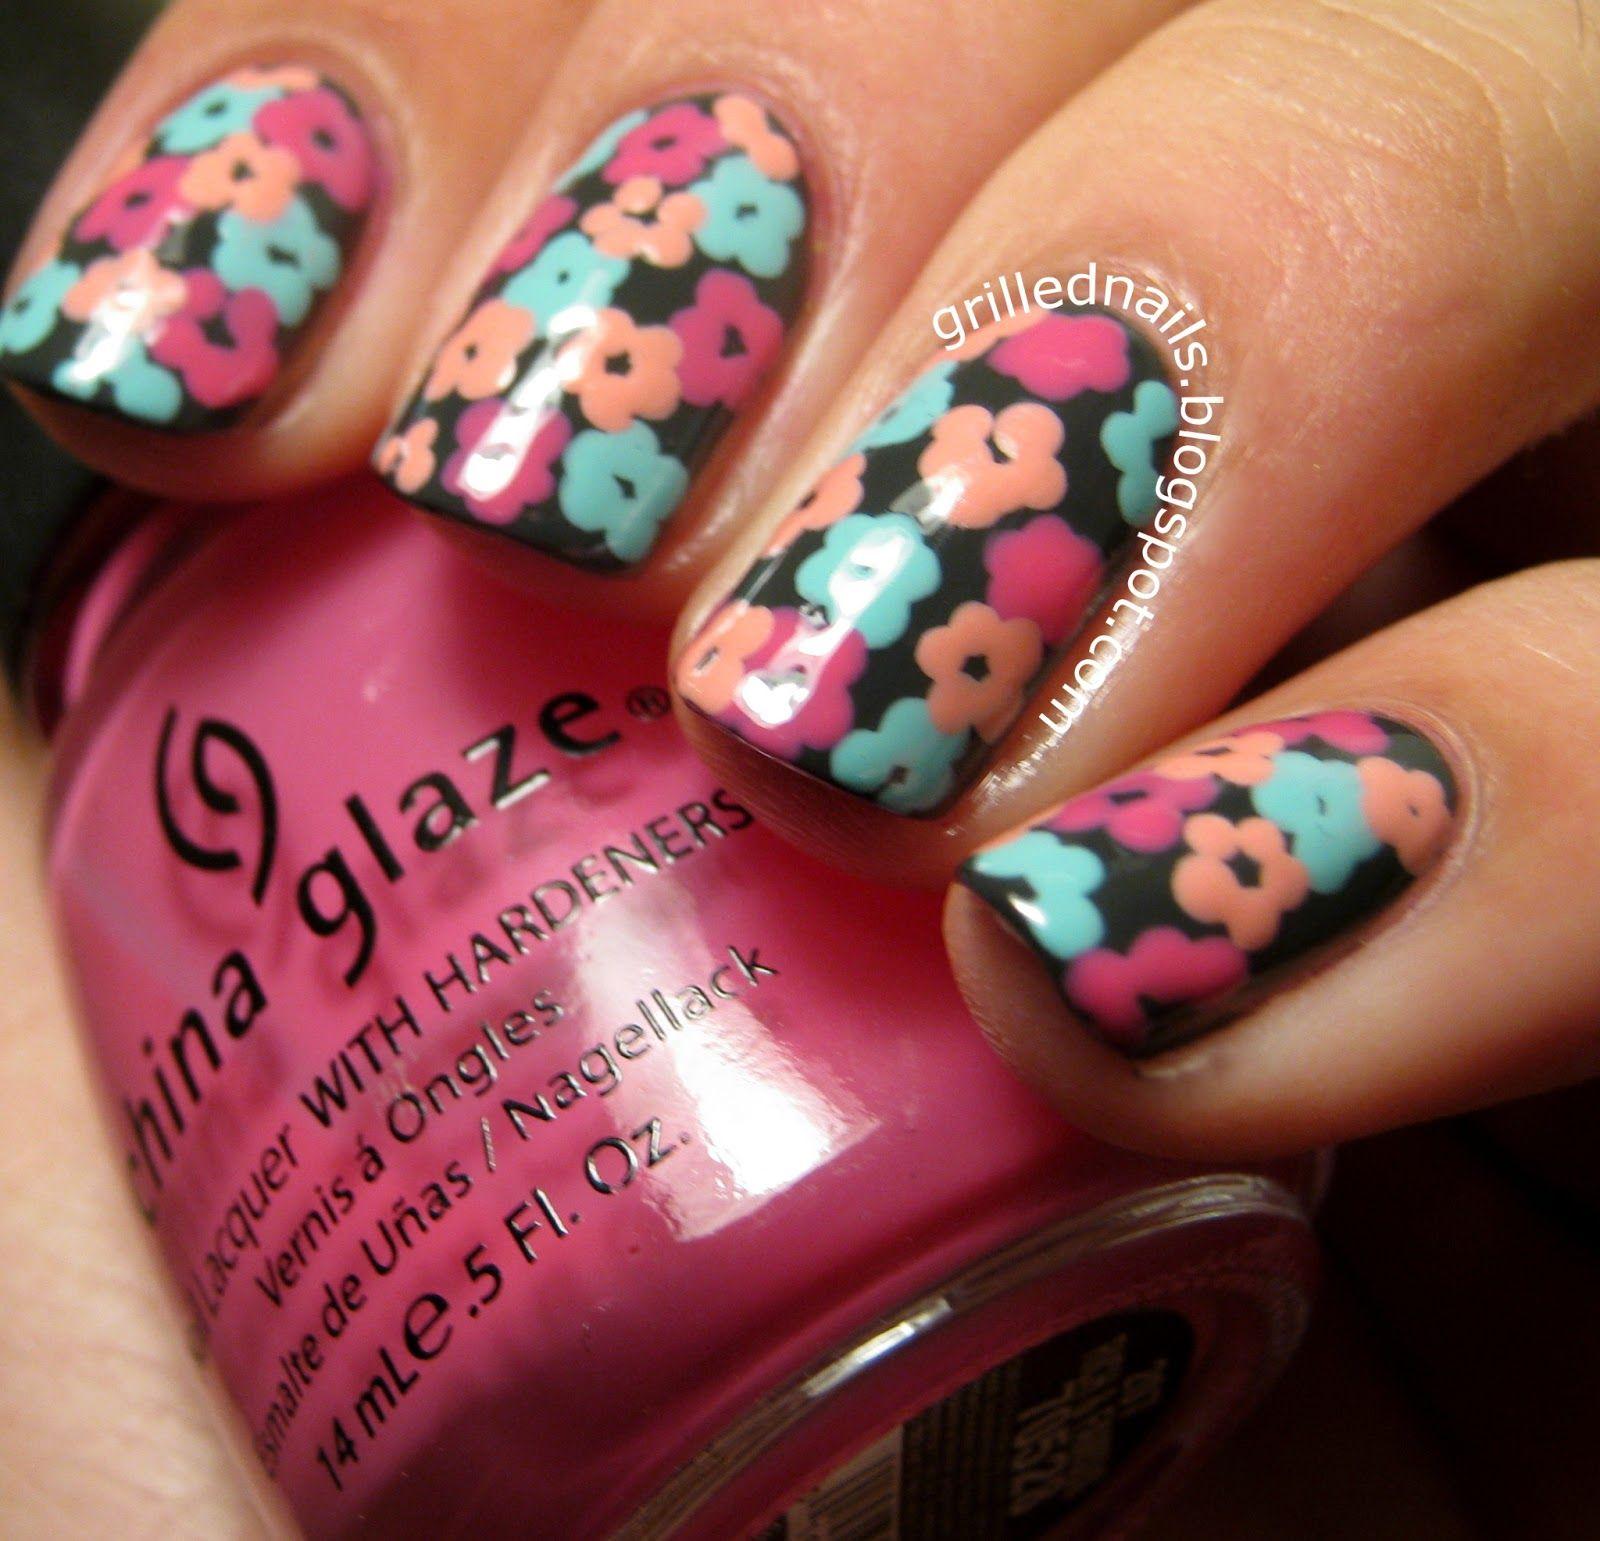 Grillednails blog hector alfaro grilled nails flower manicure nail grillednails blog hector alfaro grilled nails flower manicure nail art flowersg 16001541 pixels nail art ideas pinterest solutioingenieria Choice Image